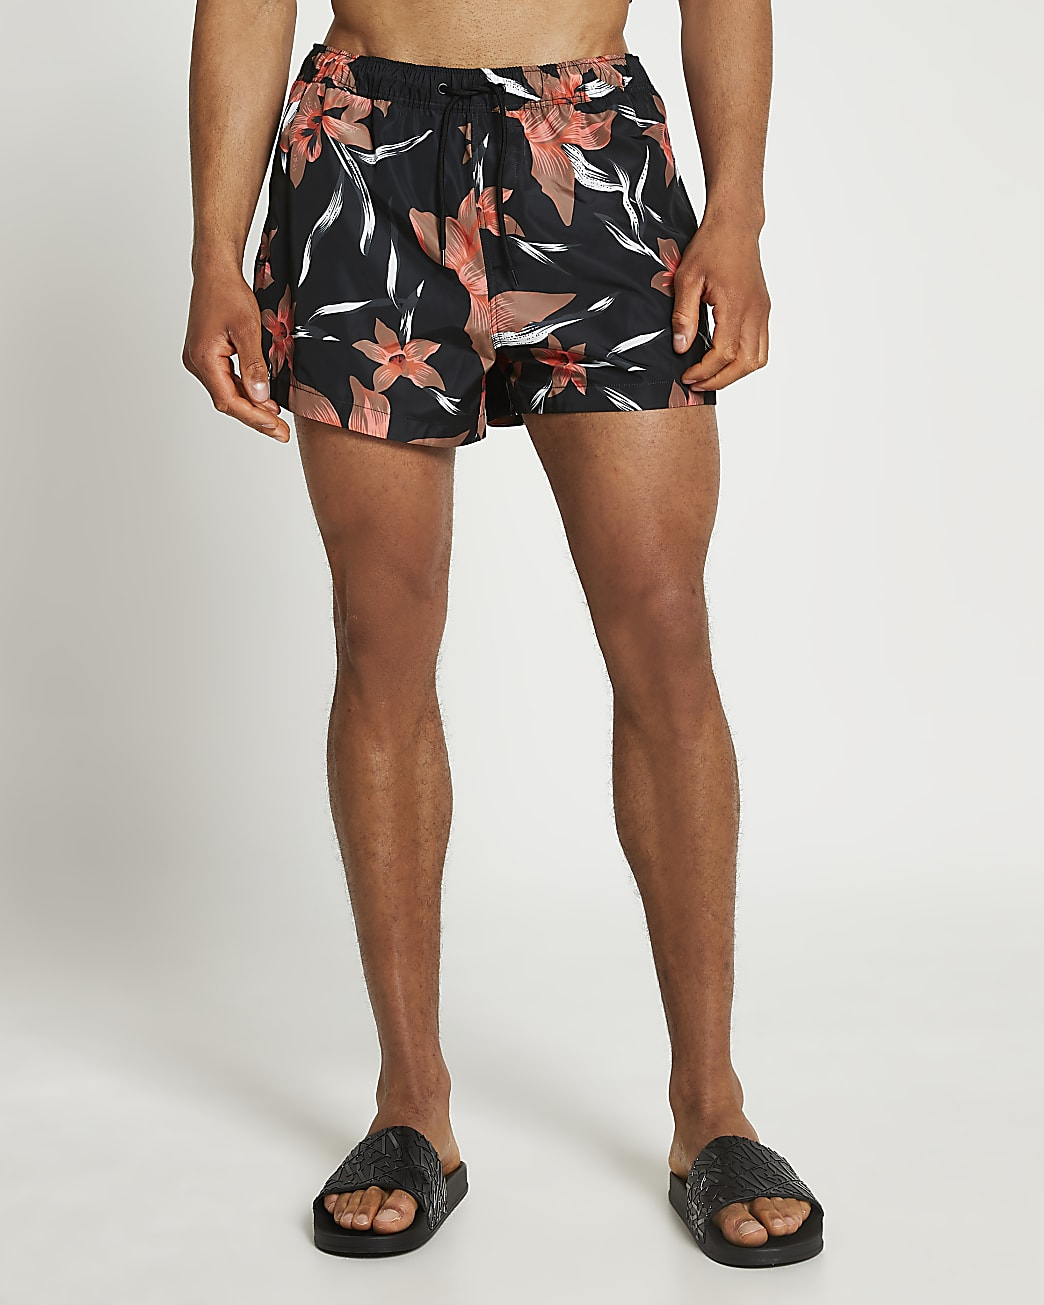 Black floral print swim shorts